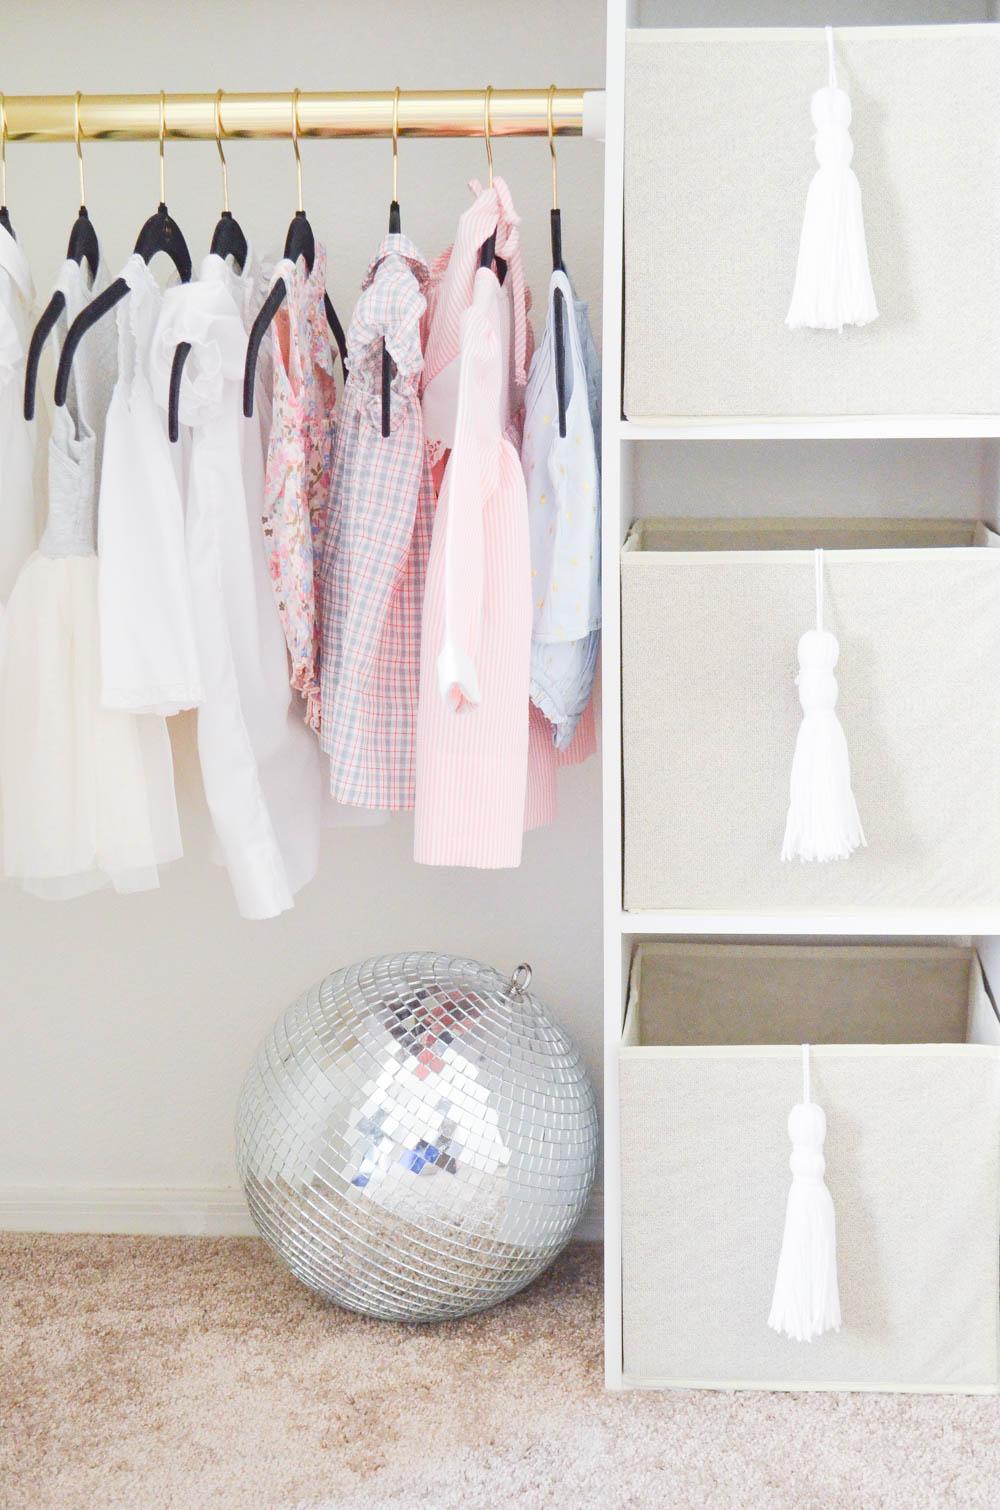 Yarn+Tassel+Storage+Bins+DIY+_+Under+$2+and+simple!+_+How+to+make+a+yarn+tassel+_+Baby+Closet (2).jpg